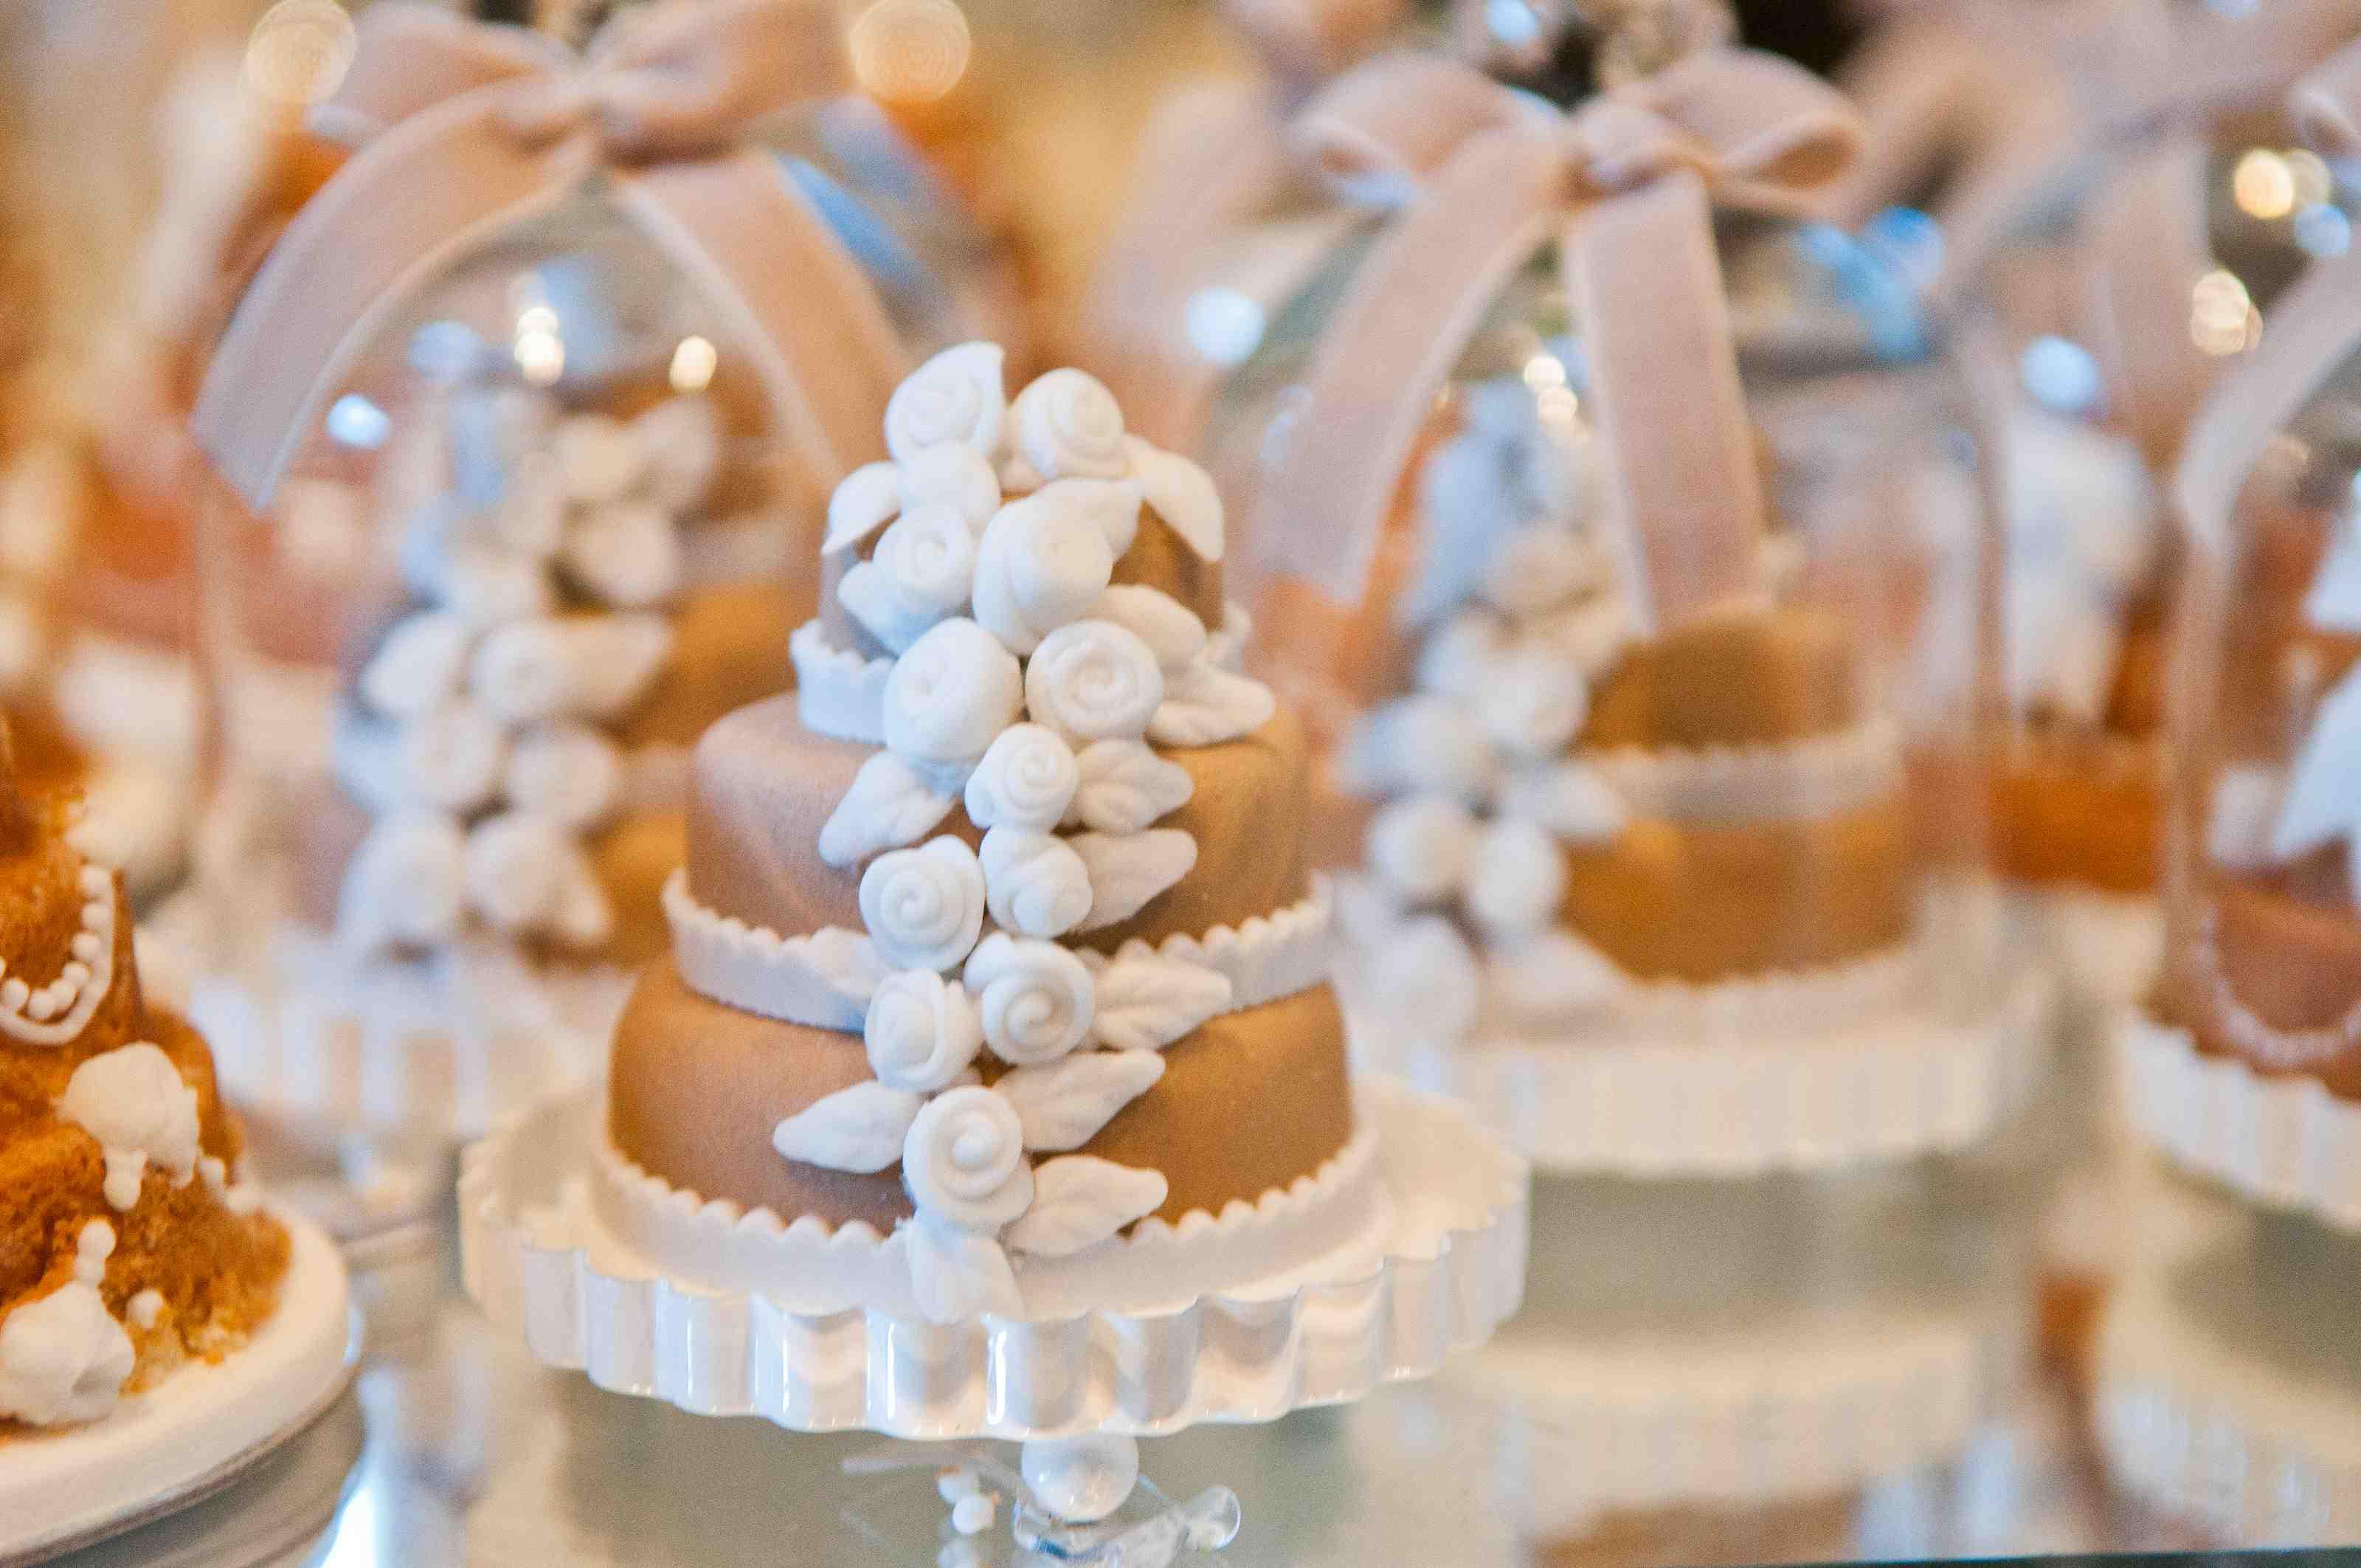 Mini Cake Kuva: toisto / Marina Barreto